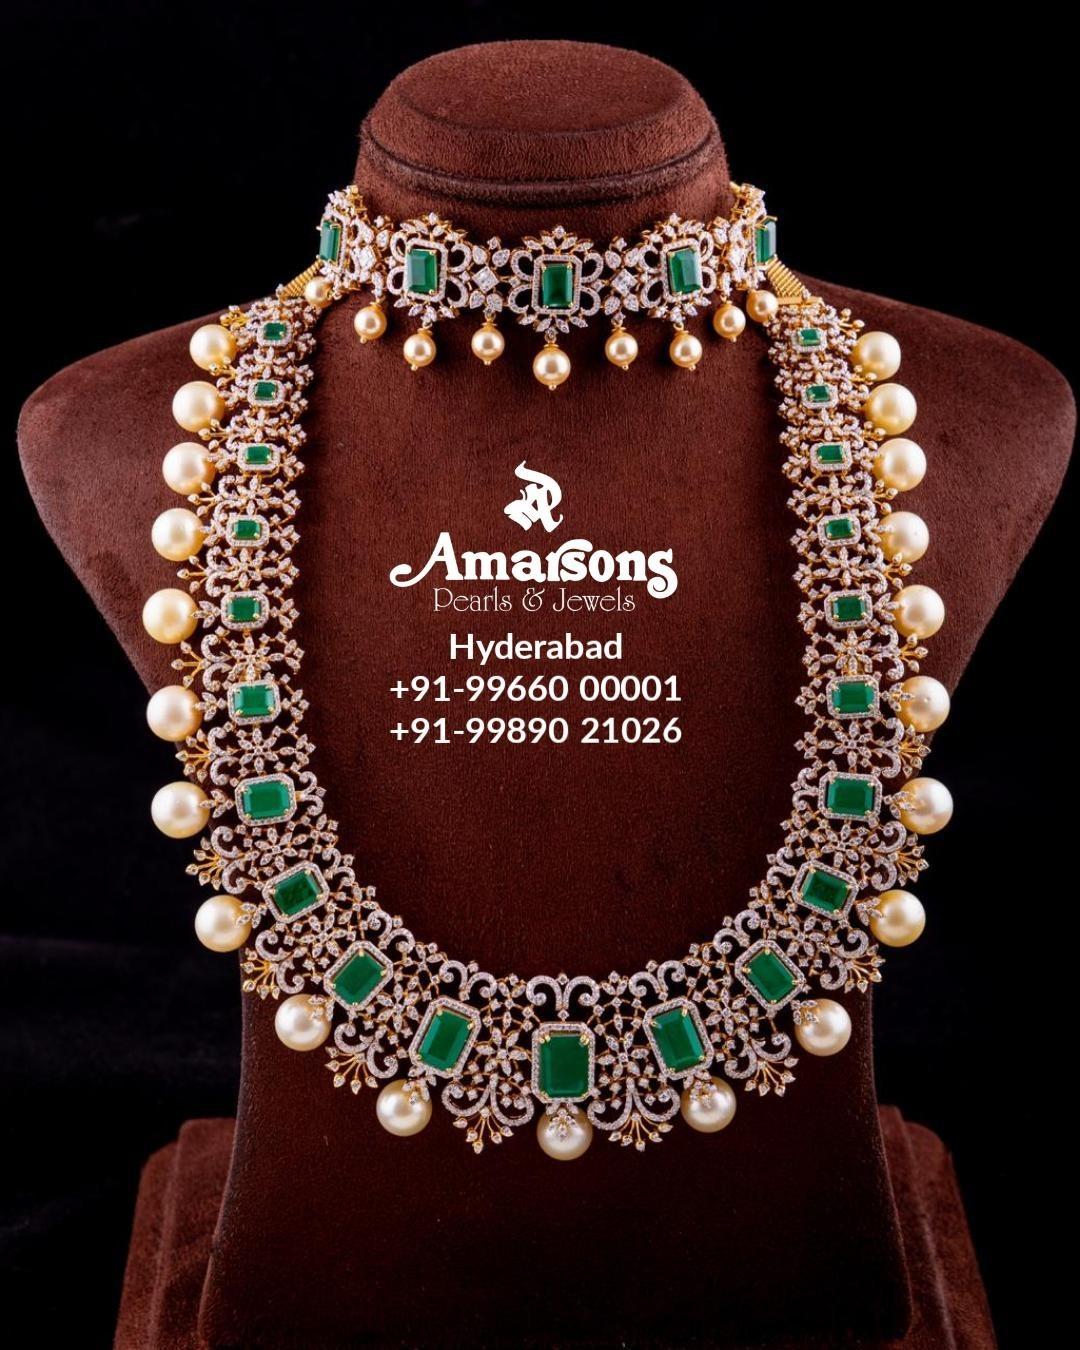 emerald-studded-diamond-choker-long-necklace